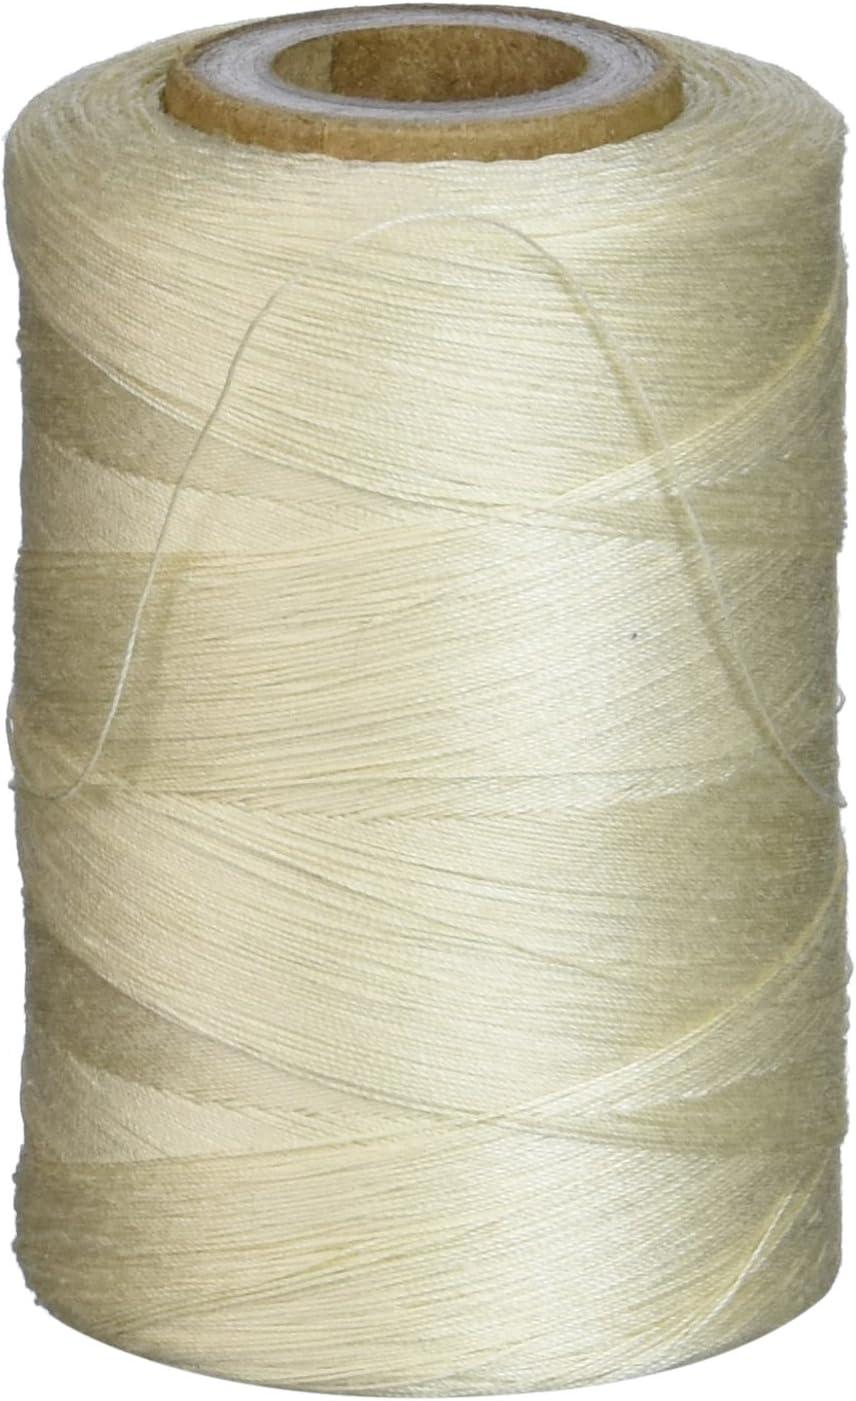 New Star Machine Quilting Thread Cotton 1200 yards V37-9 Yale Blue